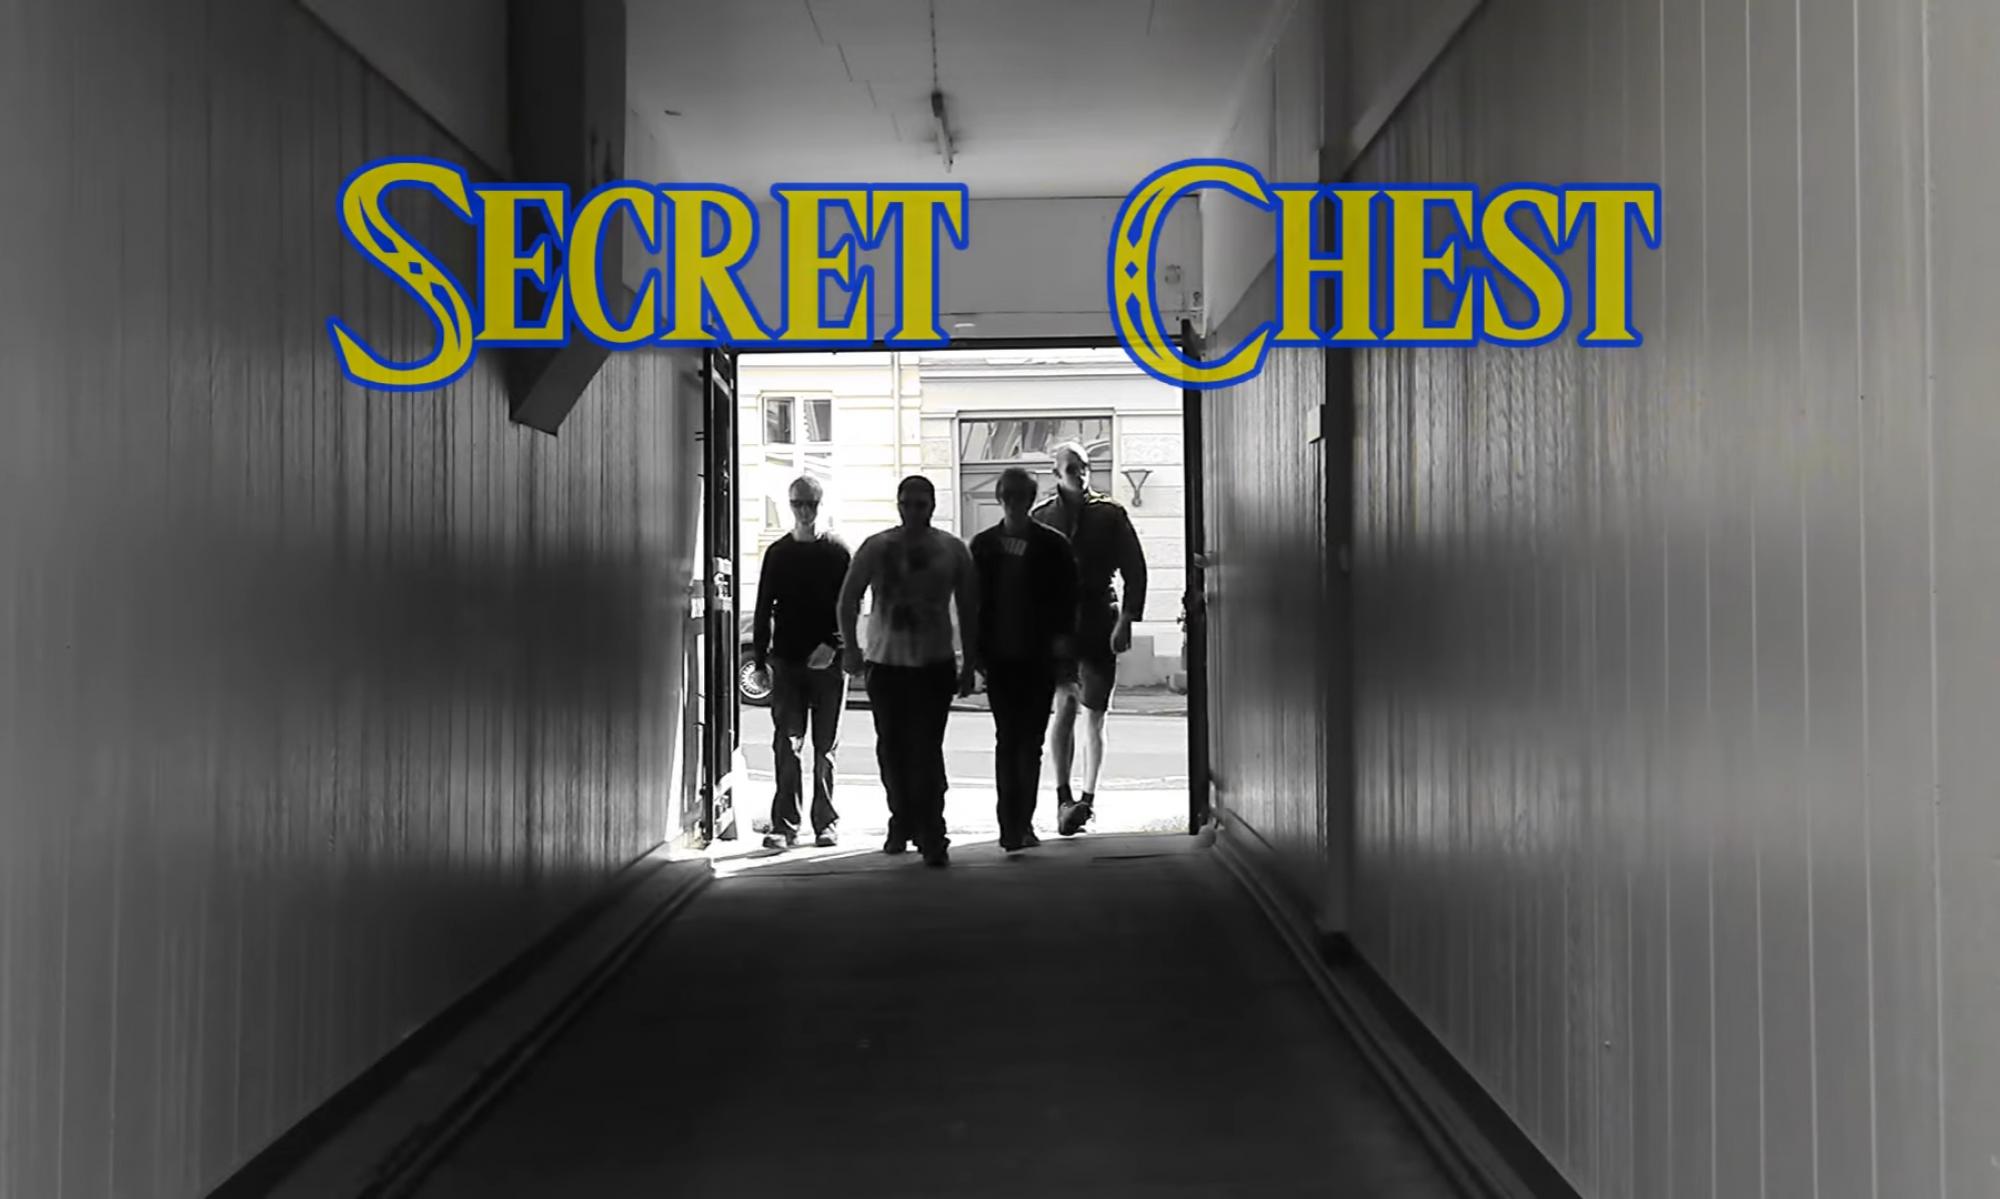 Secret Chest